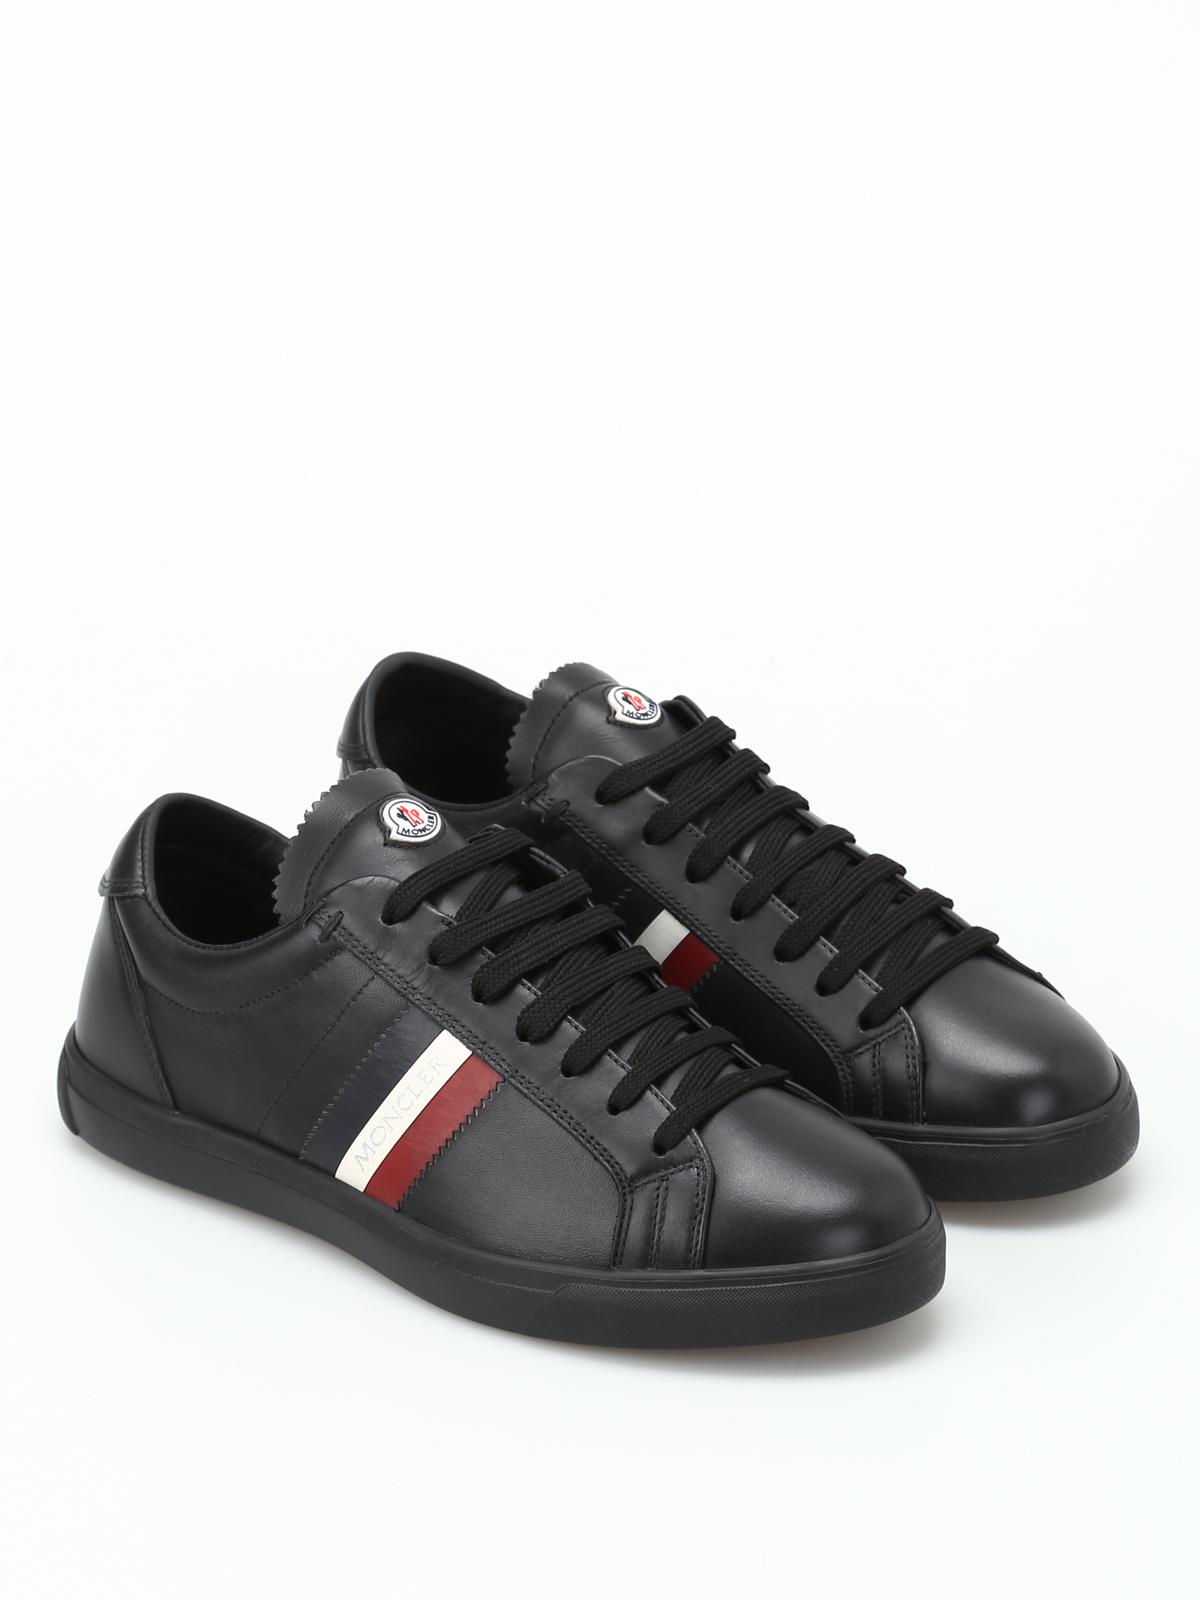 La Monaco black leather sneakers